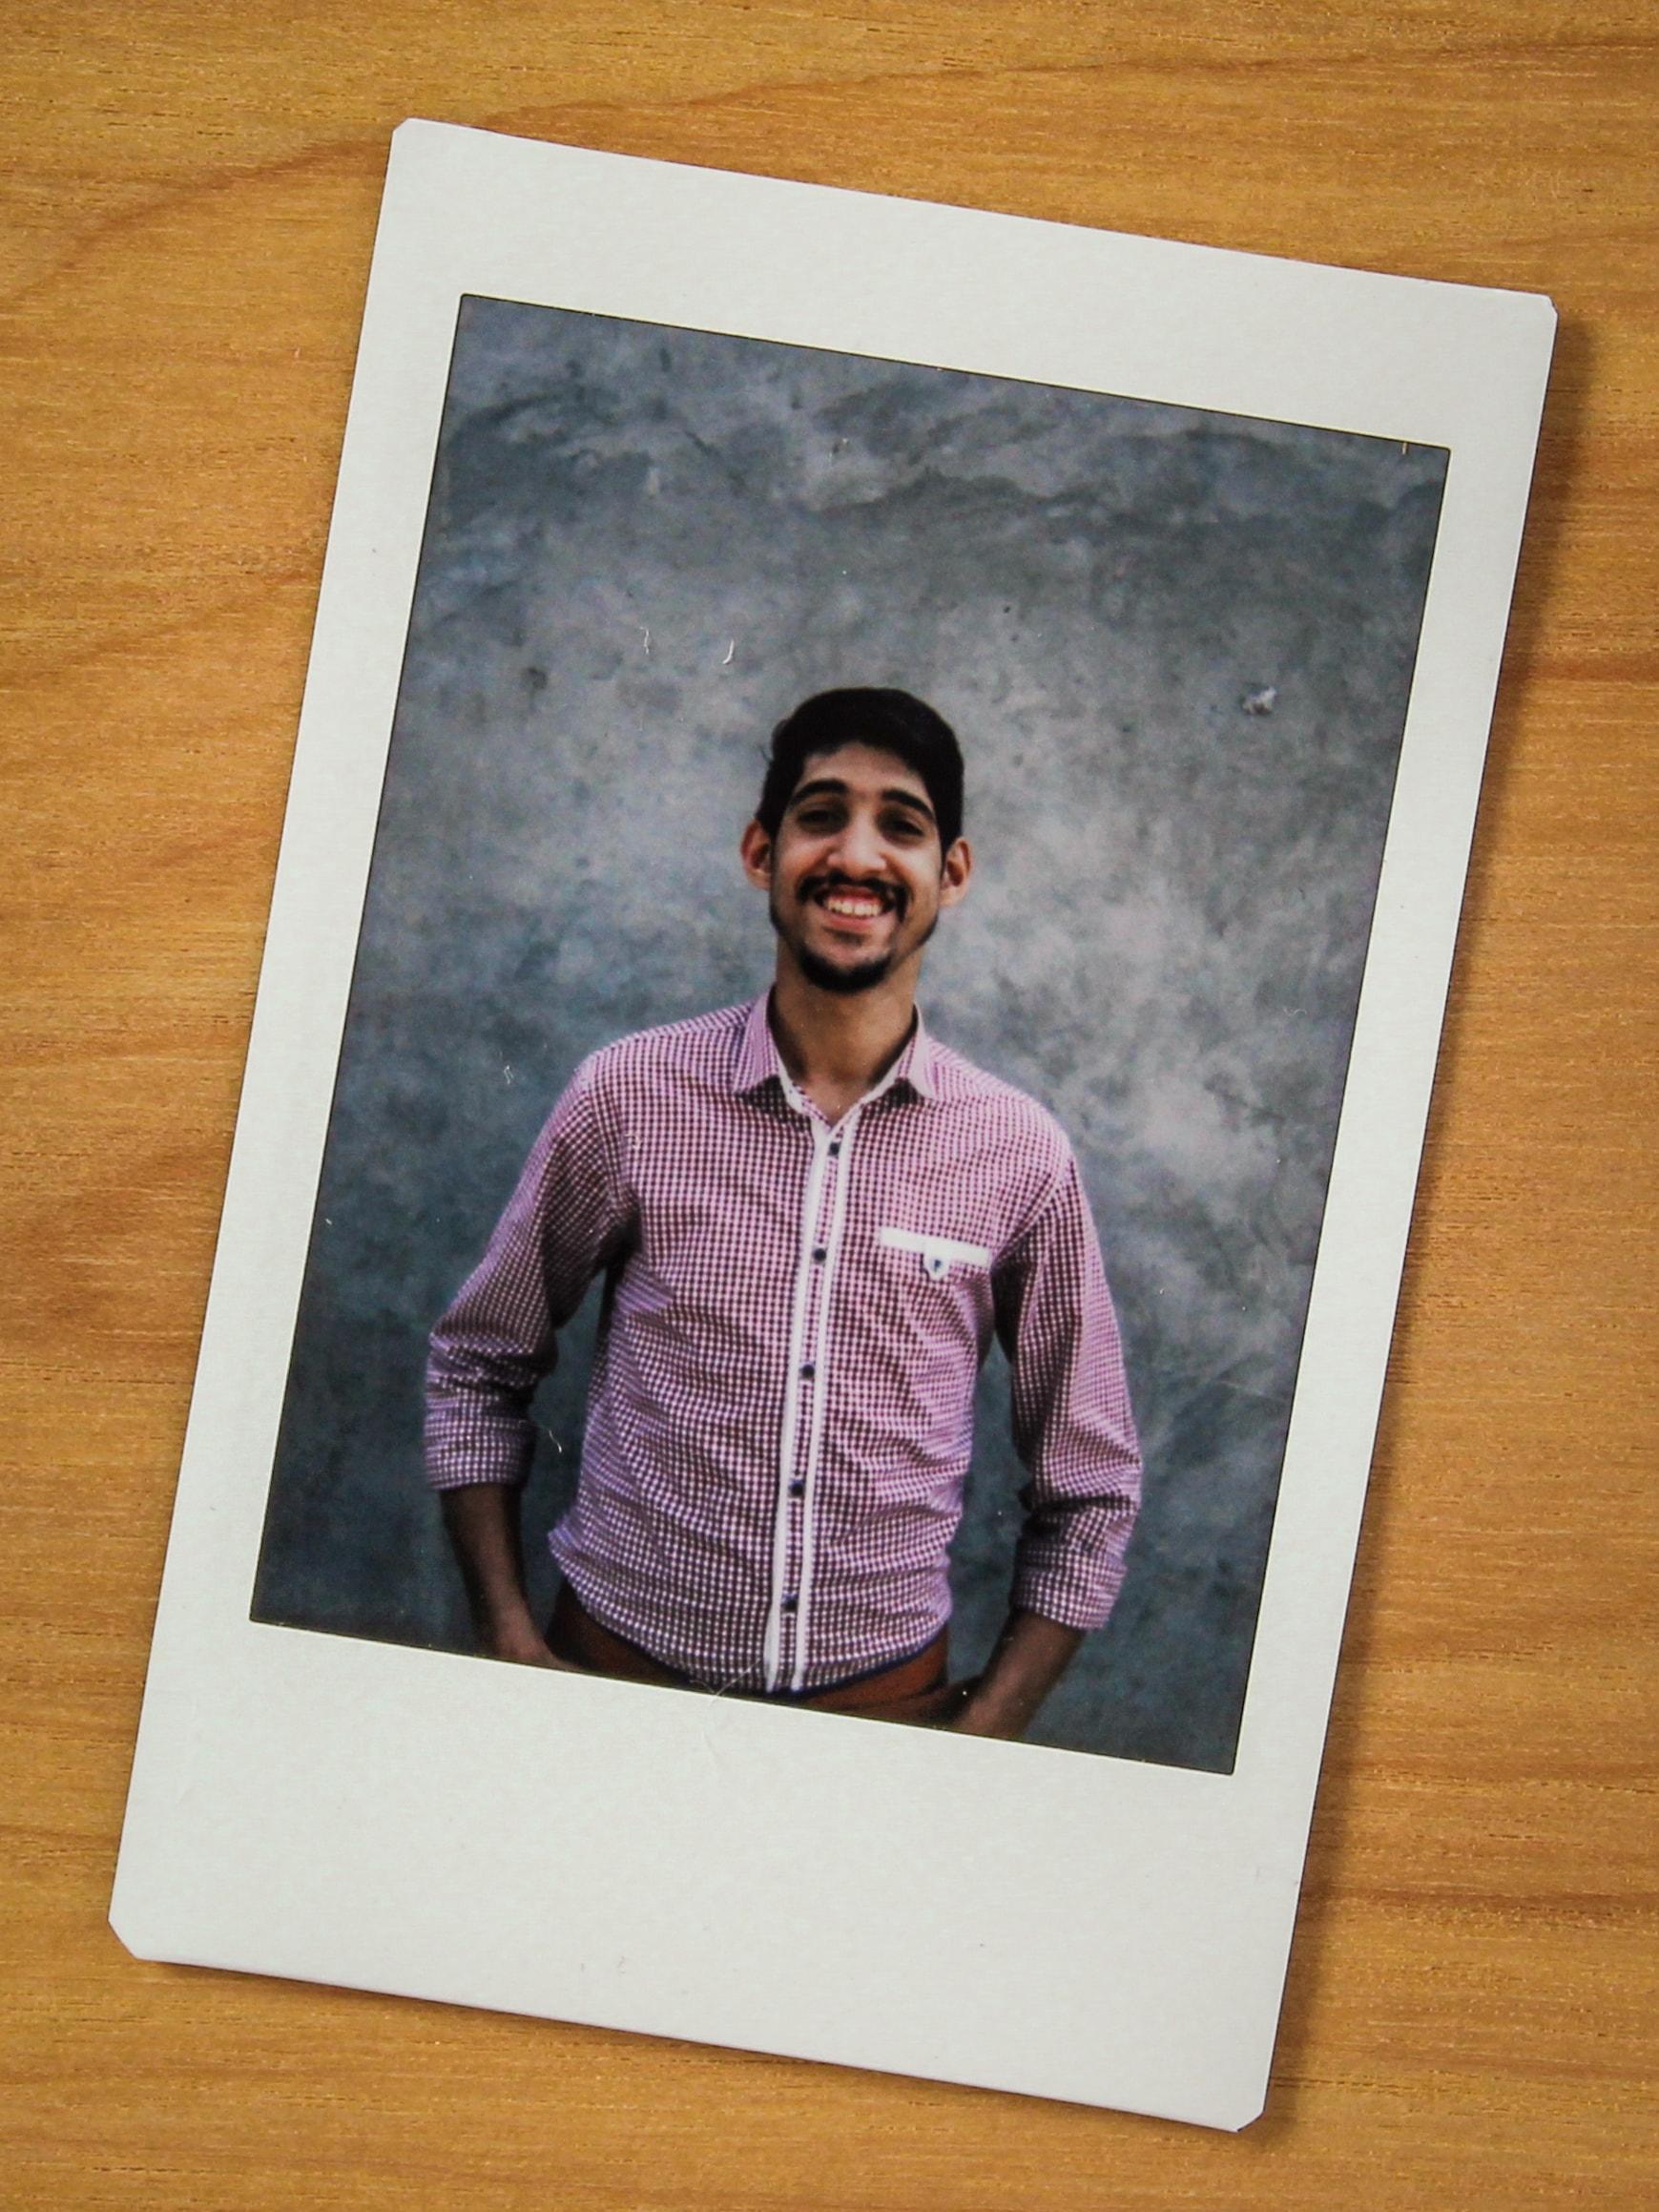 Ahmed Malik: Ahmed Malik - Director of VR & AR development, Chocolate Milk & Donuts